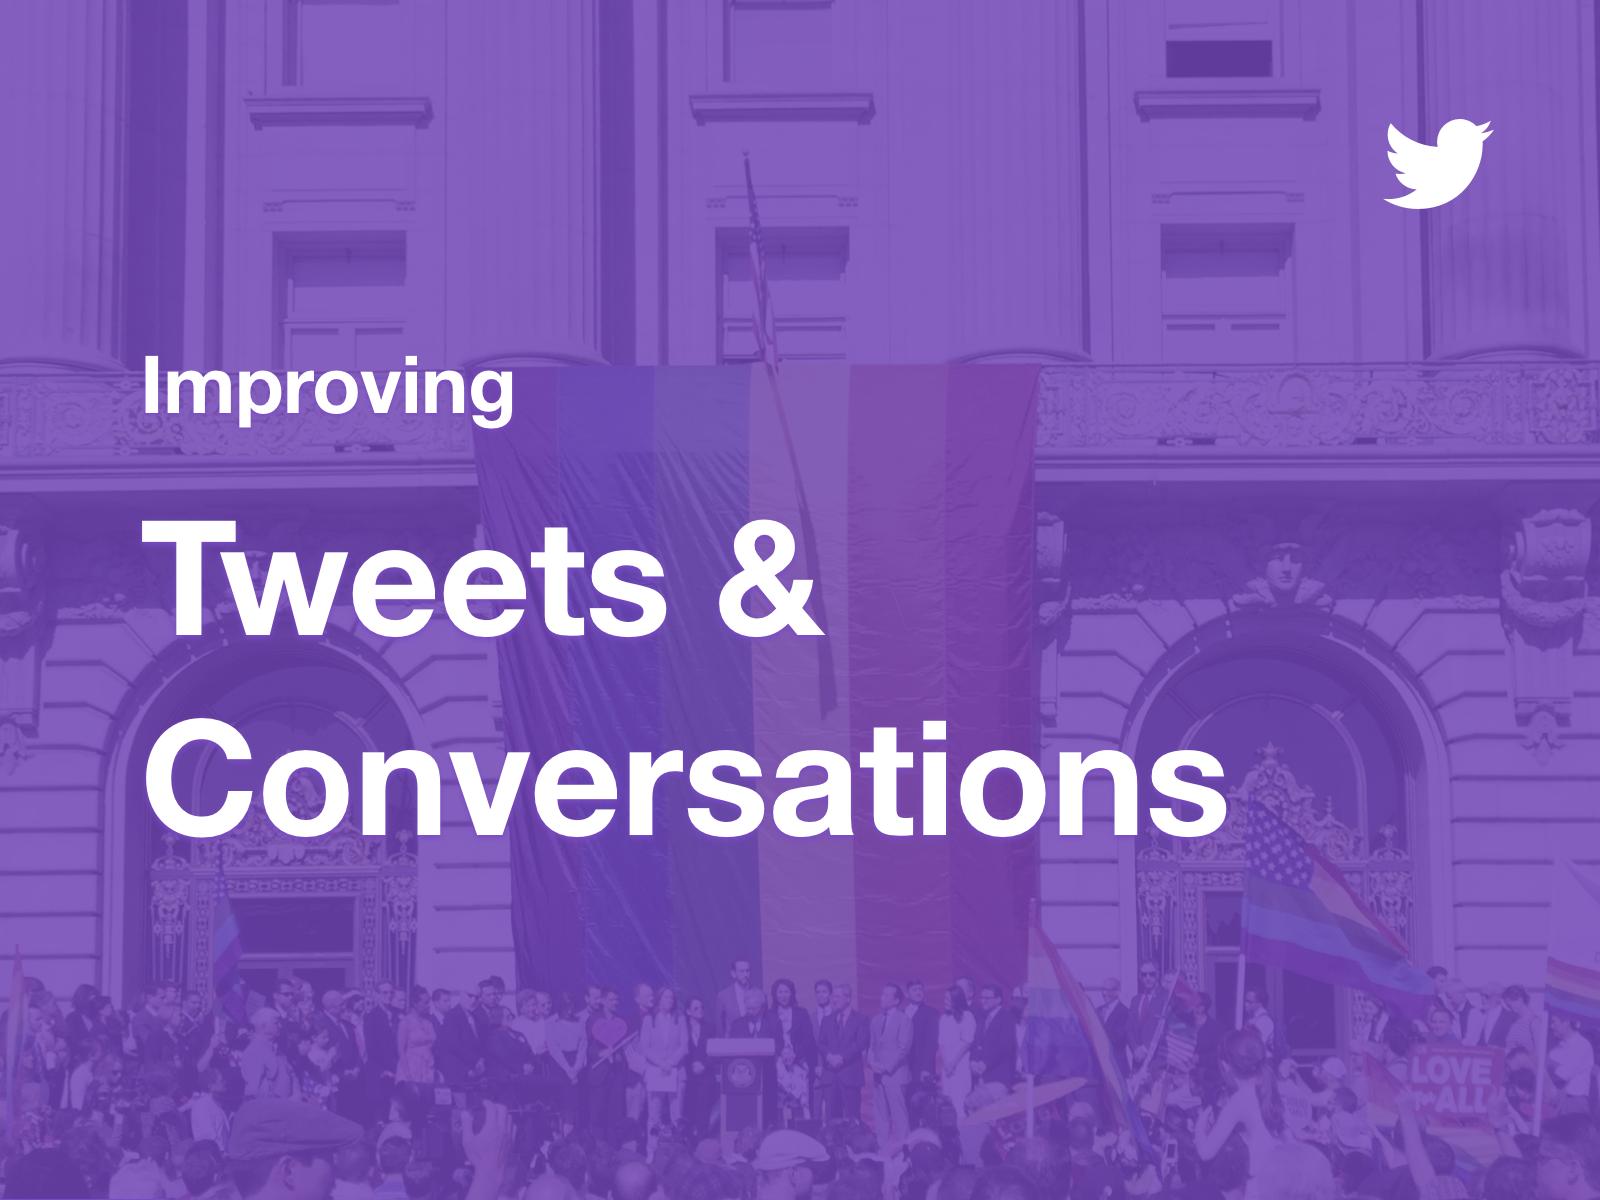 Improving Tweets & Conversations